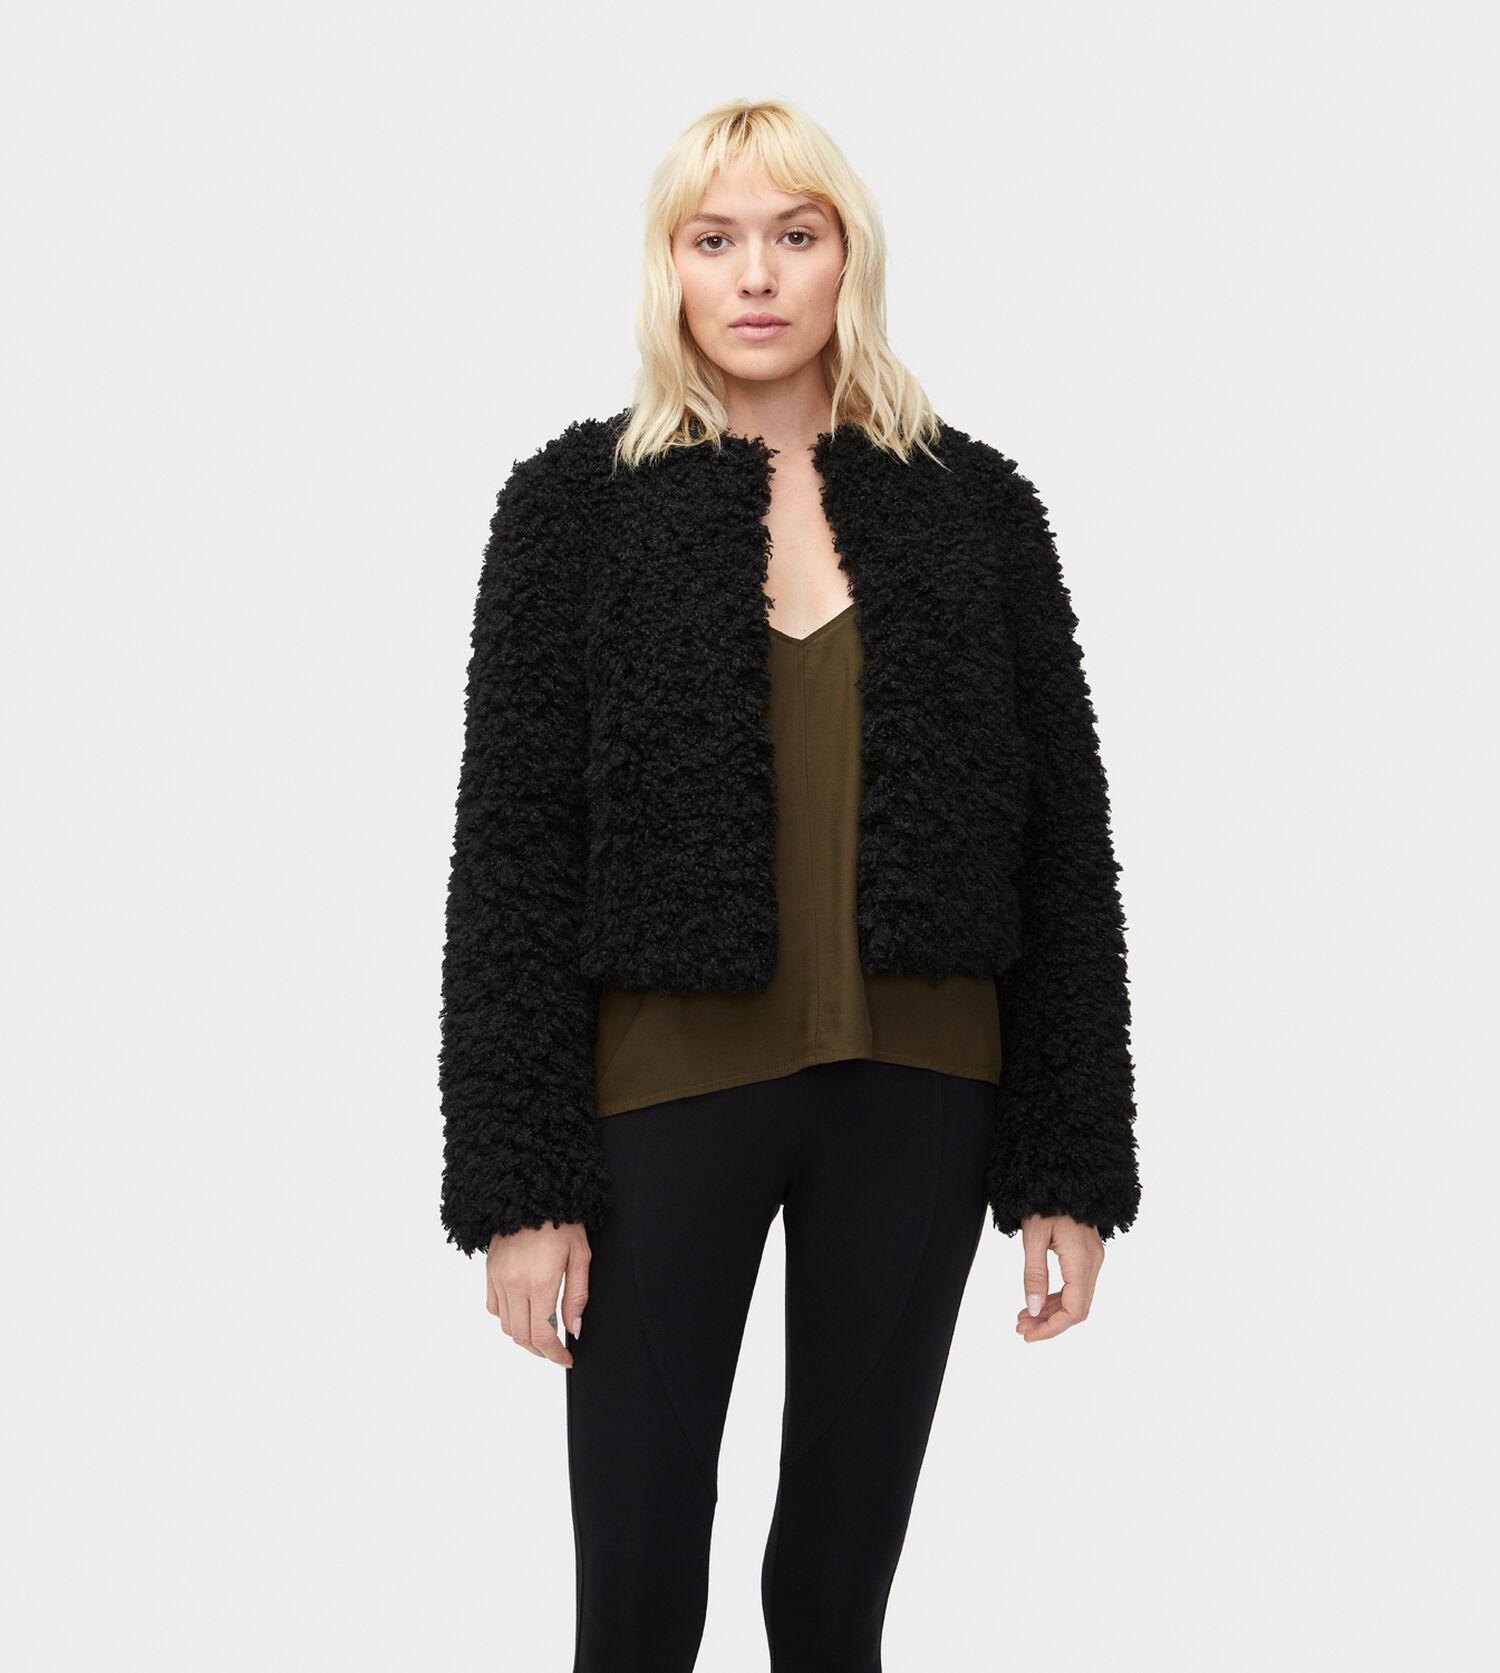 696df448371b Zoom Lorrena Faux Fur Jacket - Image 1 of 5